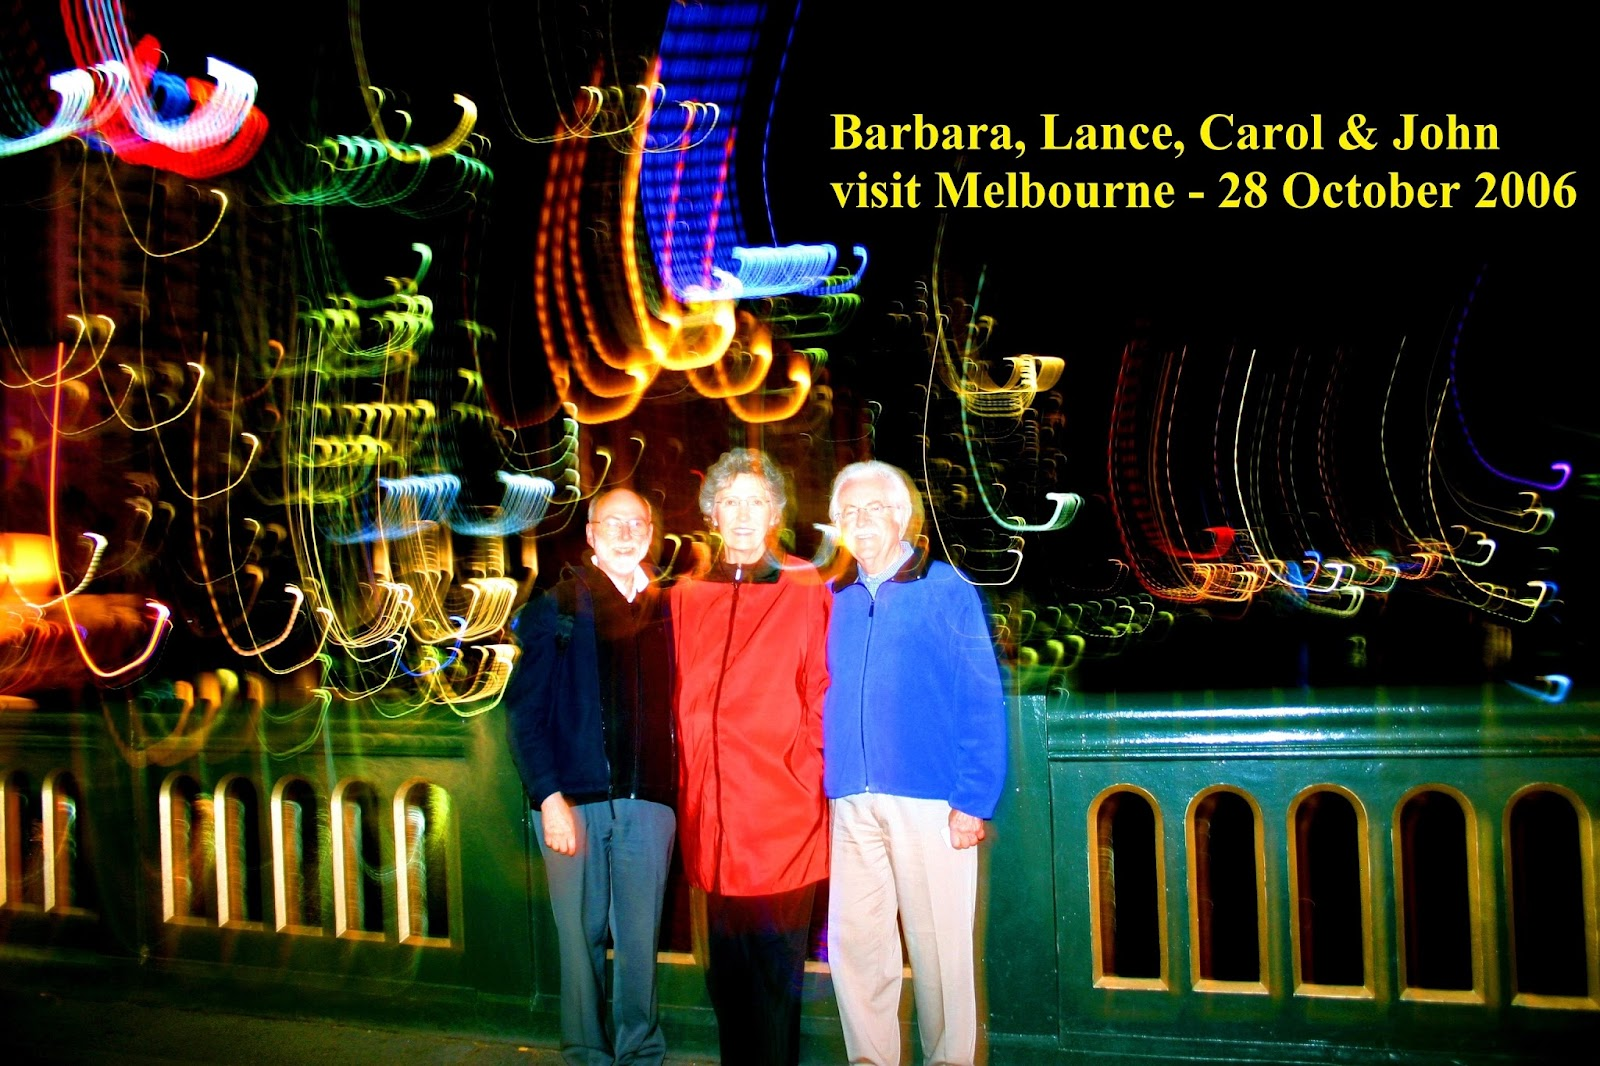 _20061028_224734_011x_Melbourne.jpg